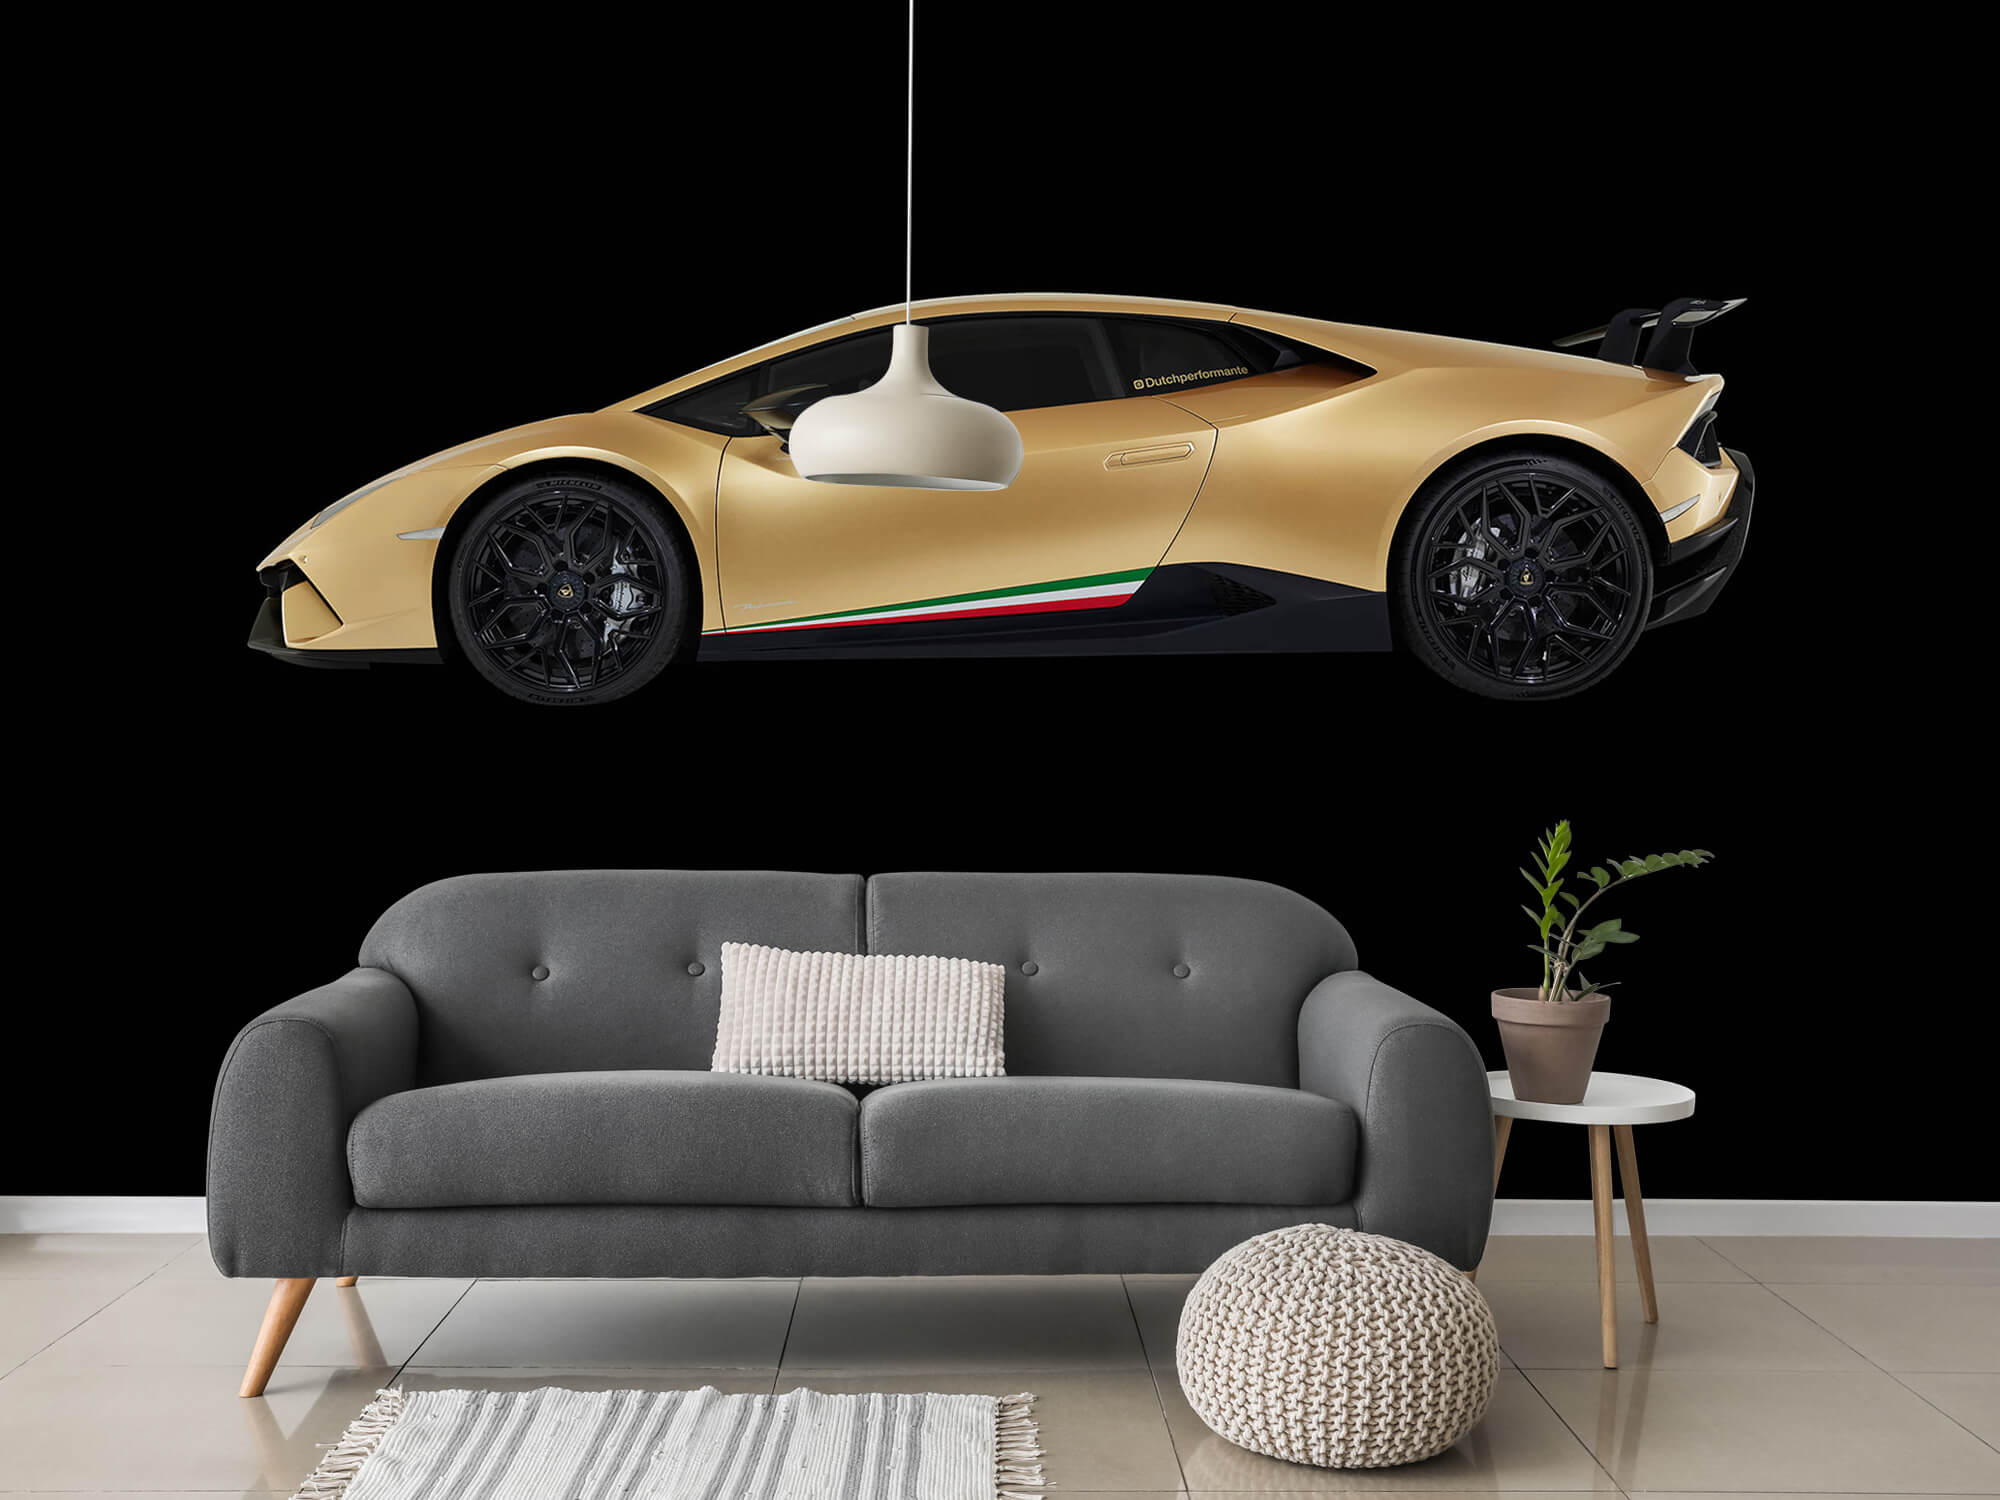 Wallpaper Lamborghini Huracán - Côté, noir 15